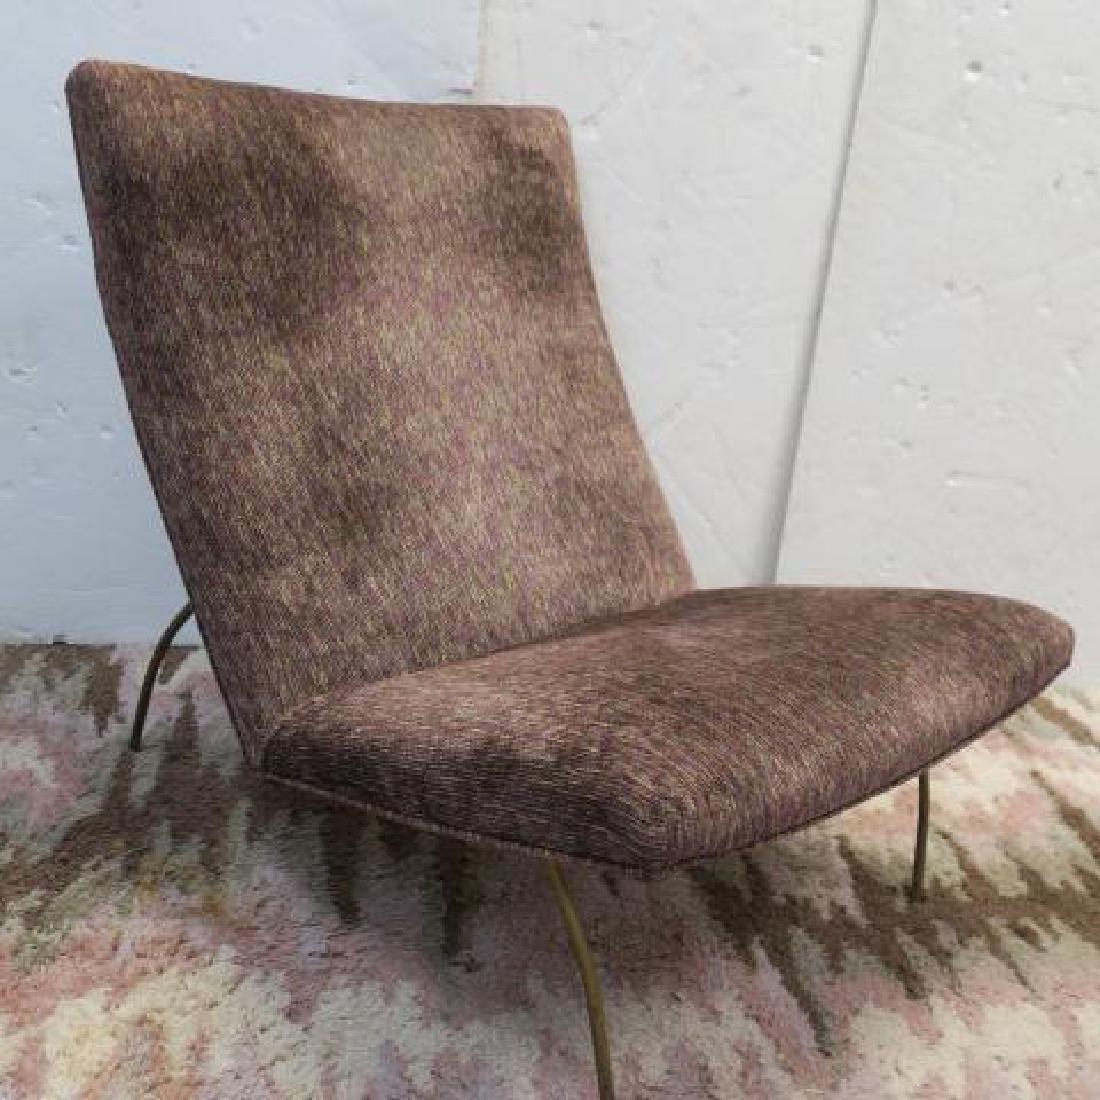 Metal Frame Upholstered Lounge Chair and Ottoman: - 2